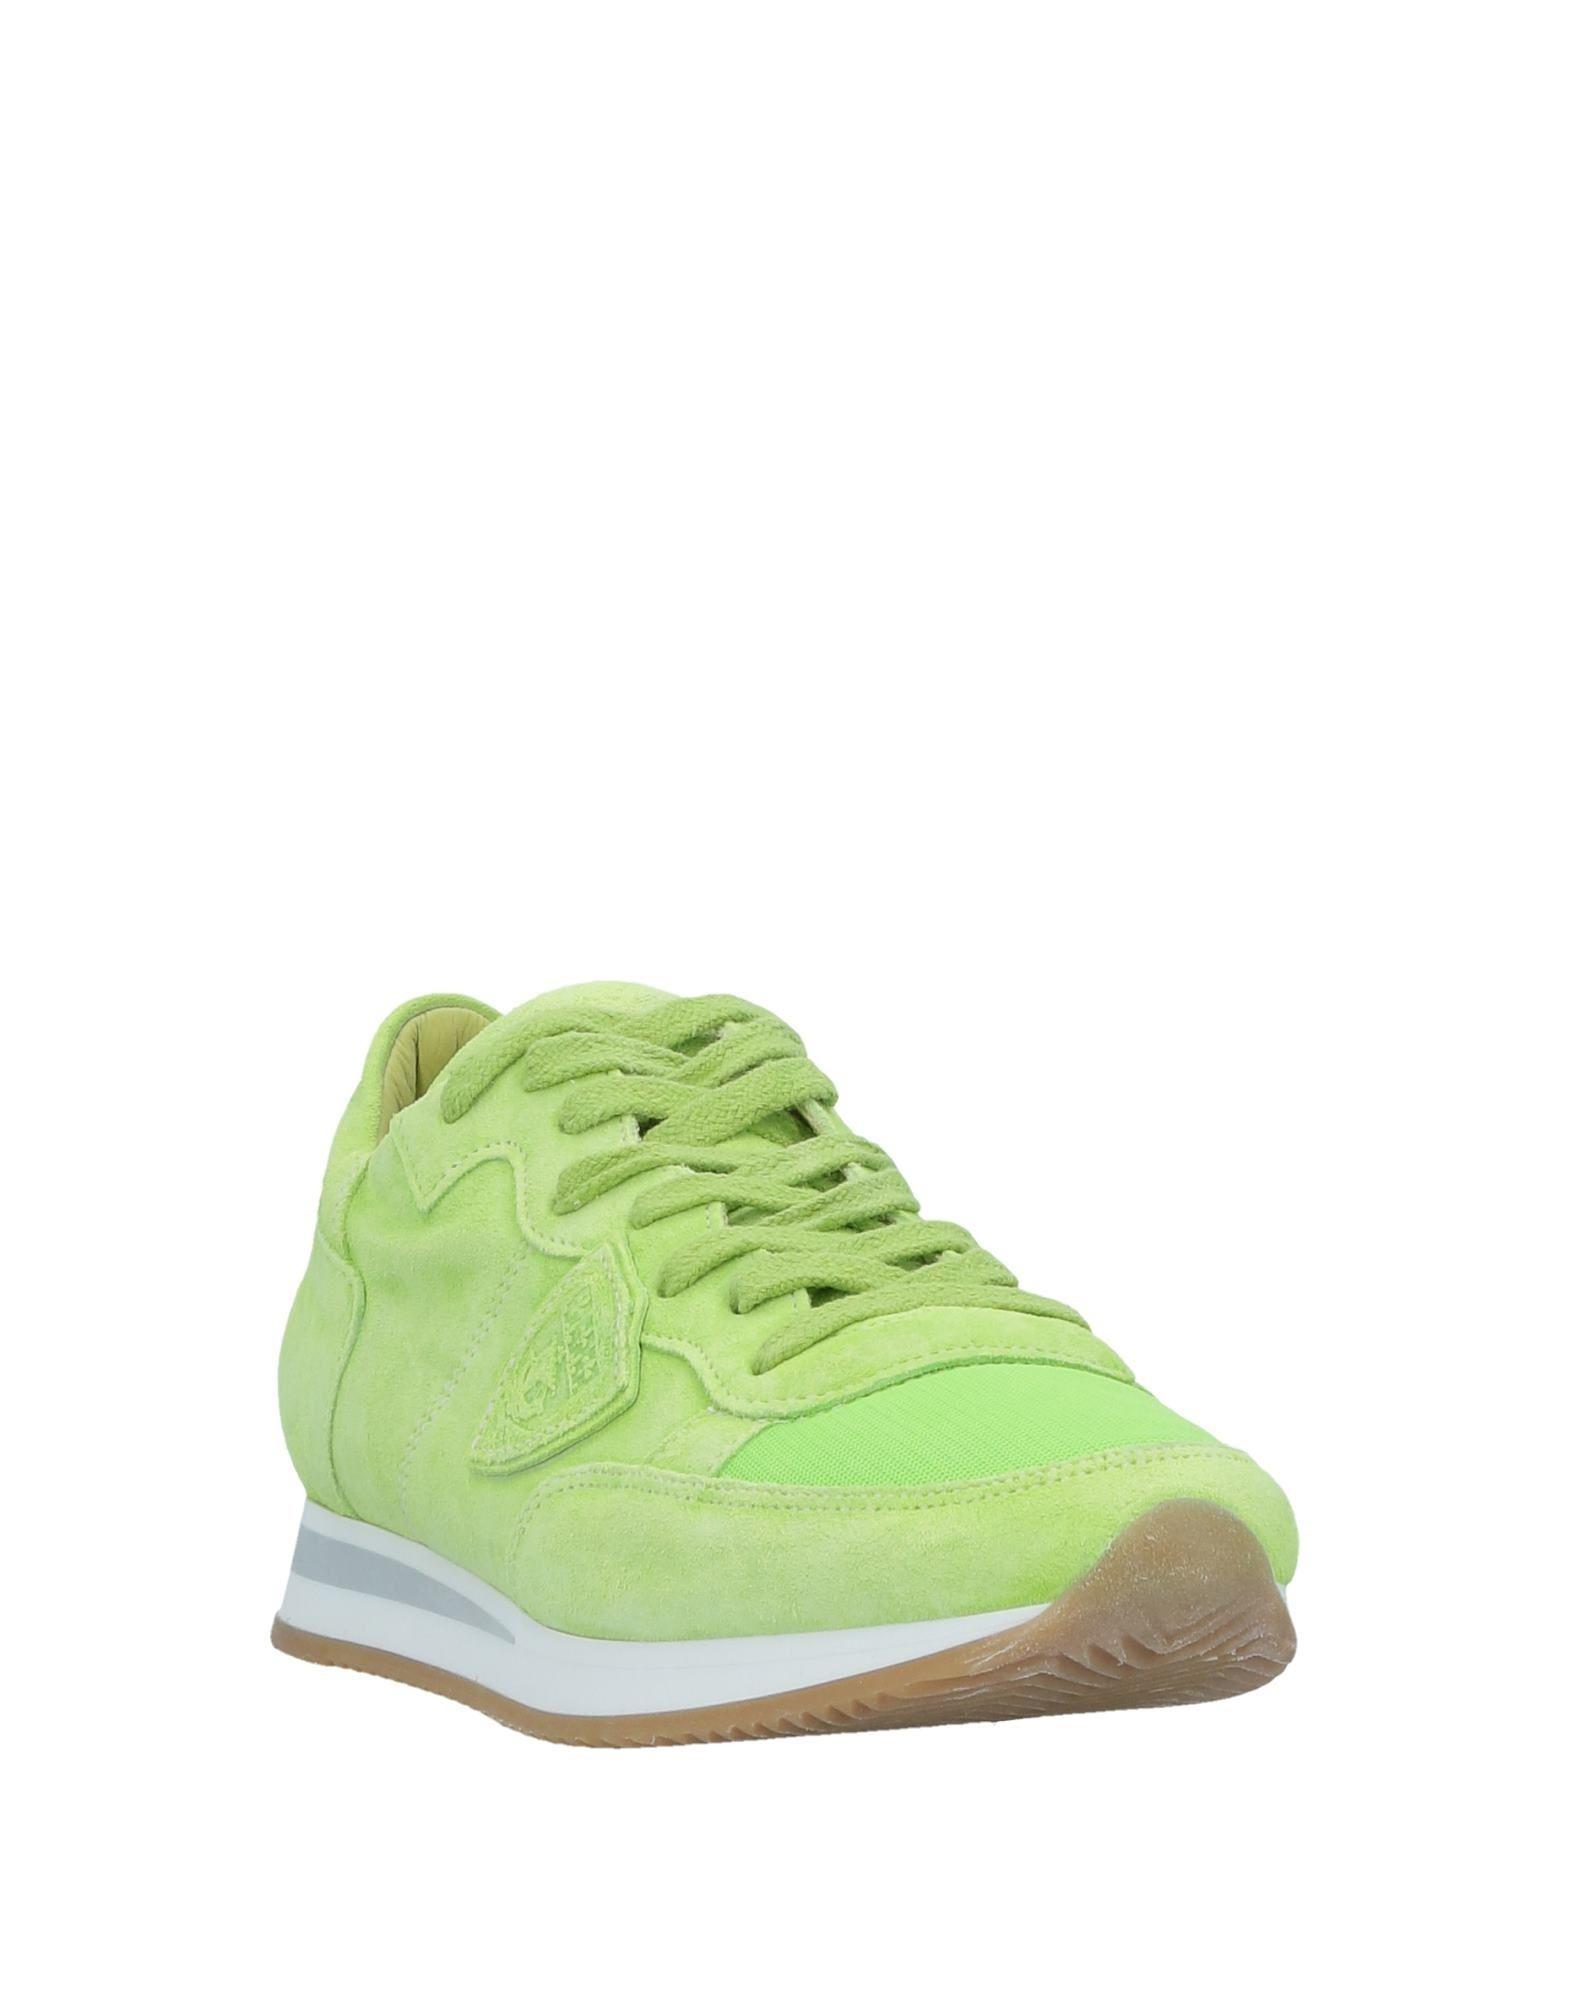 Philippe Model Suede Low-tops & Sneakers in Acid Green (Green)